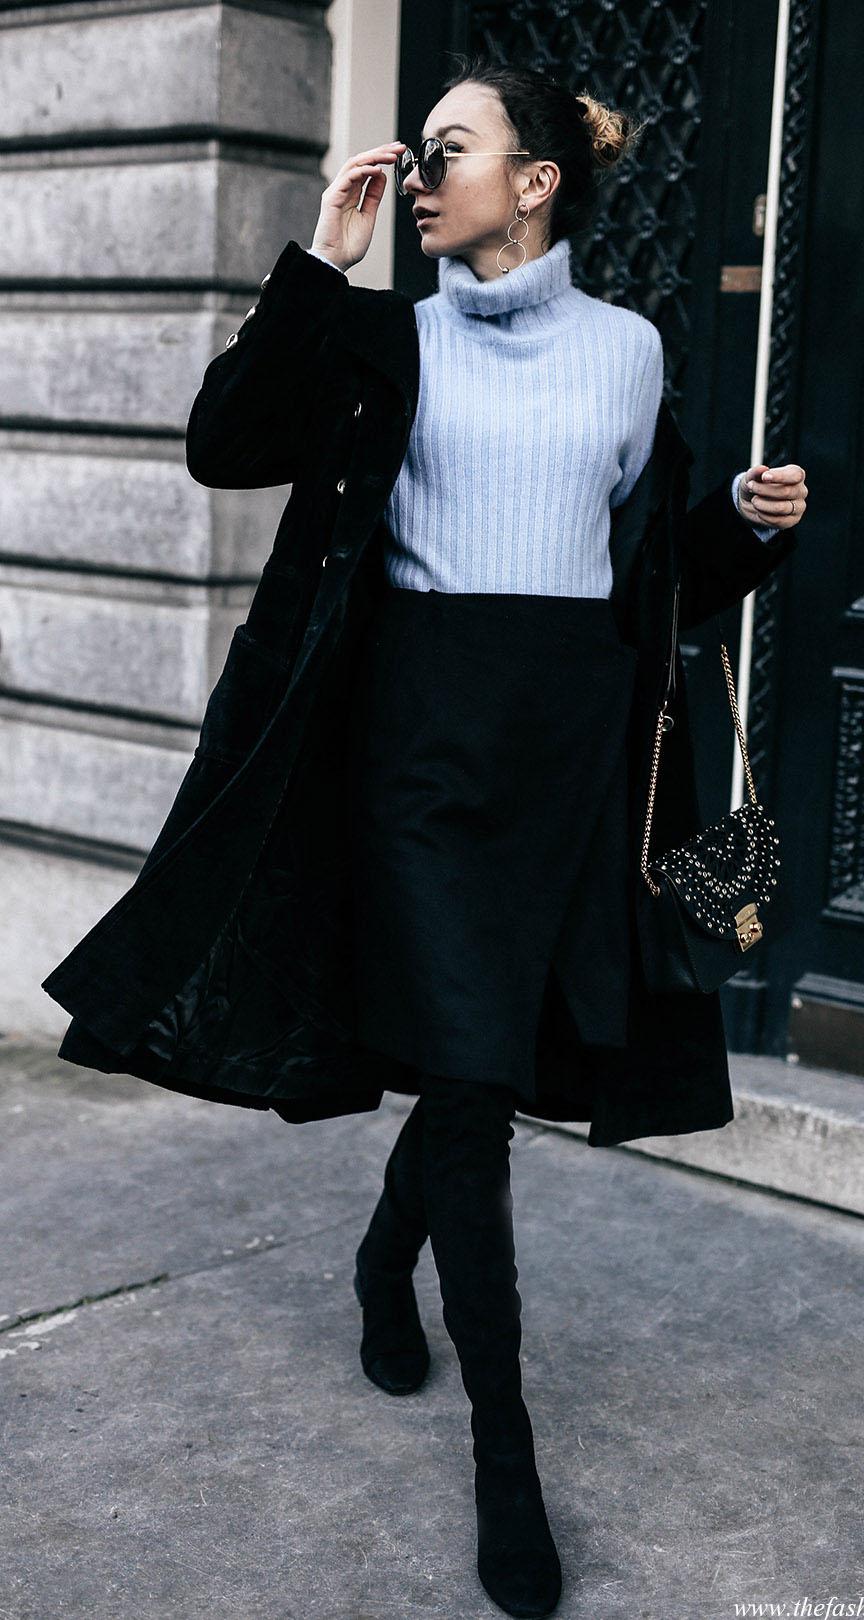 black-aline-skirt-blue-light-sweater-turleneck-black-jacket-coat-black-shoe-boots-bun-sun-earrings-black-bag-fall-winter-hairr-lunch.jpg